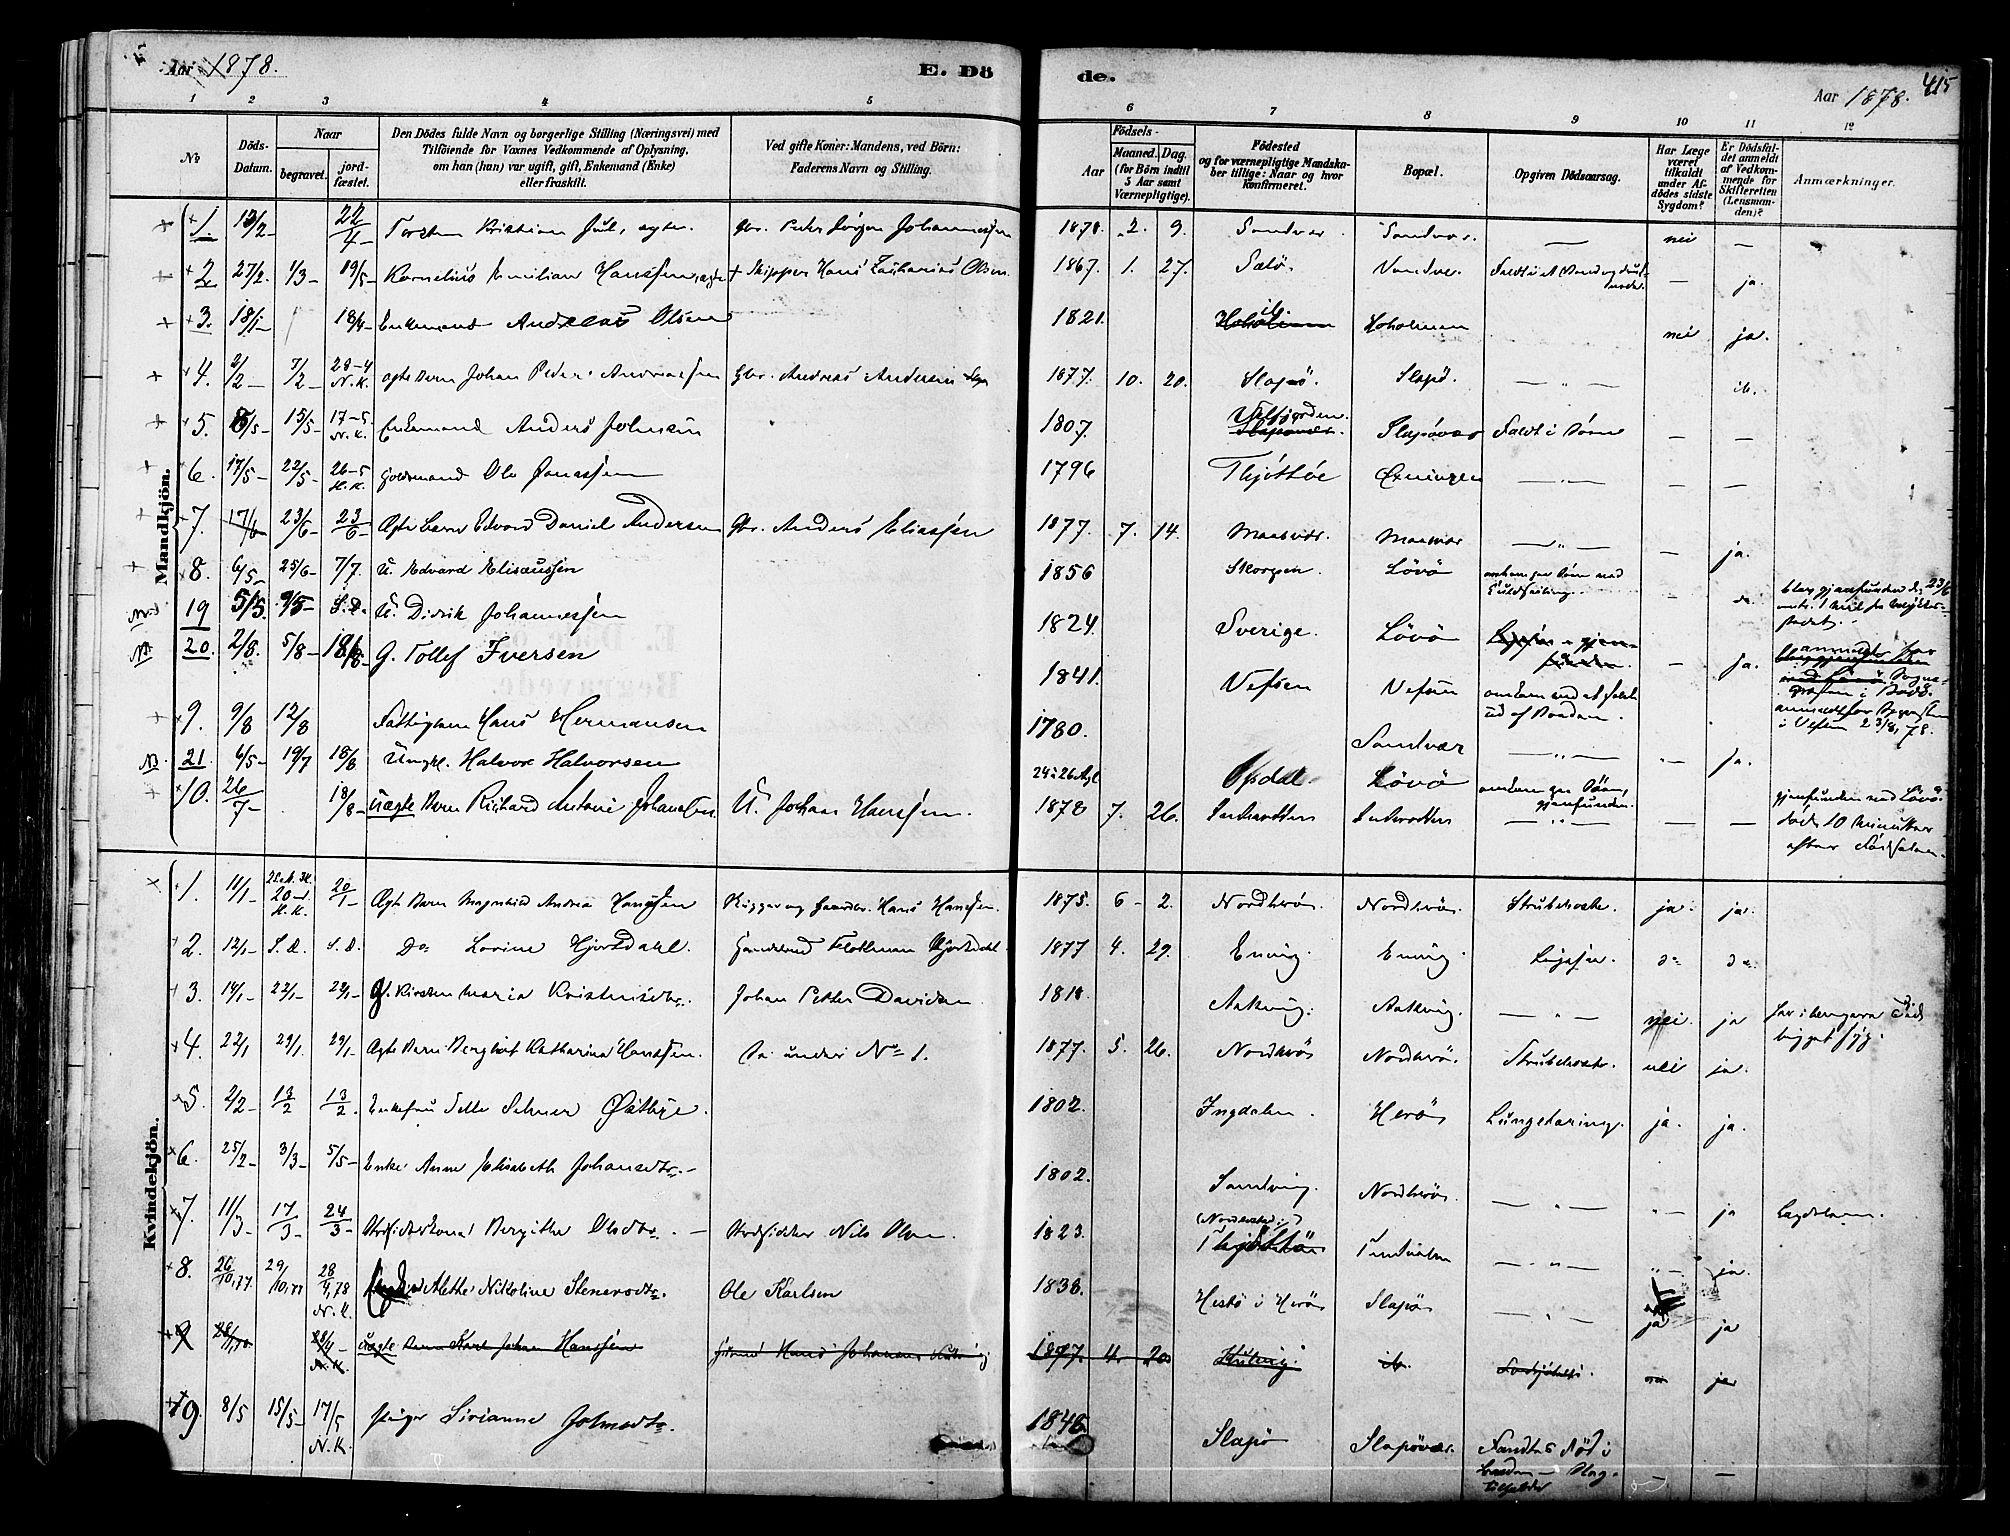 SAT, Ministerialprotokoller, klokkerbøker og fødselsregistre - Nordland, 834/L0507: Ministerialbok nr. 834A05, 1878-1892, s. 415